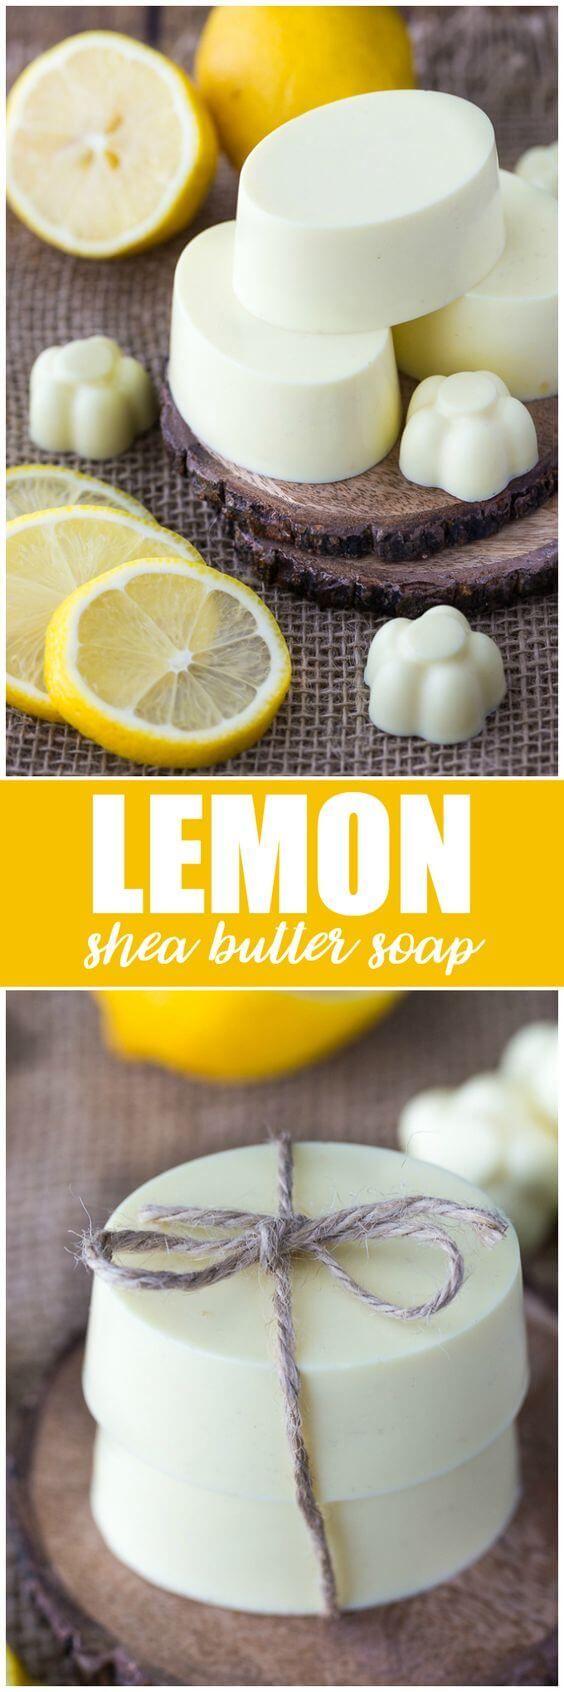 doTERRA Essential Oil Lemon Shea Butter Soap Recipe